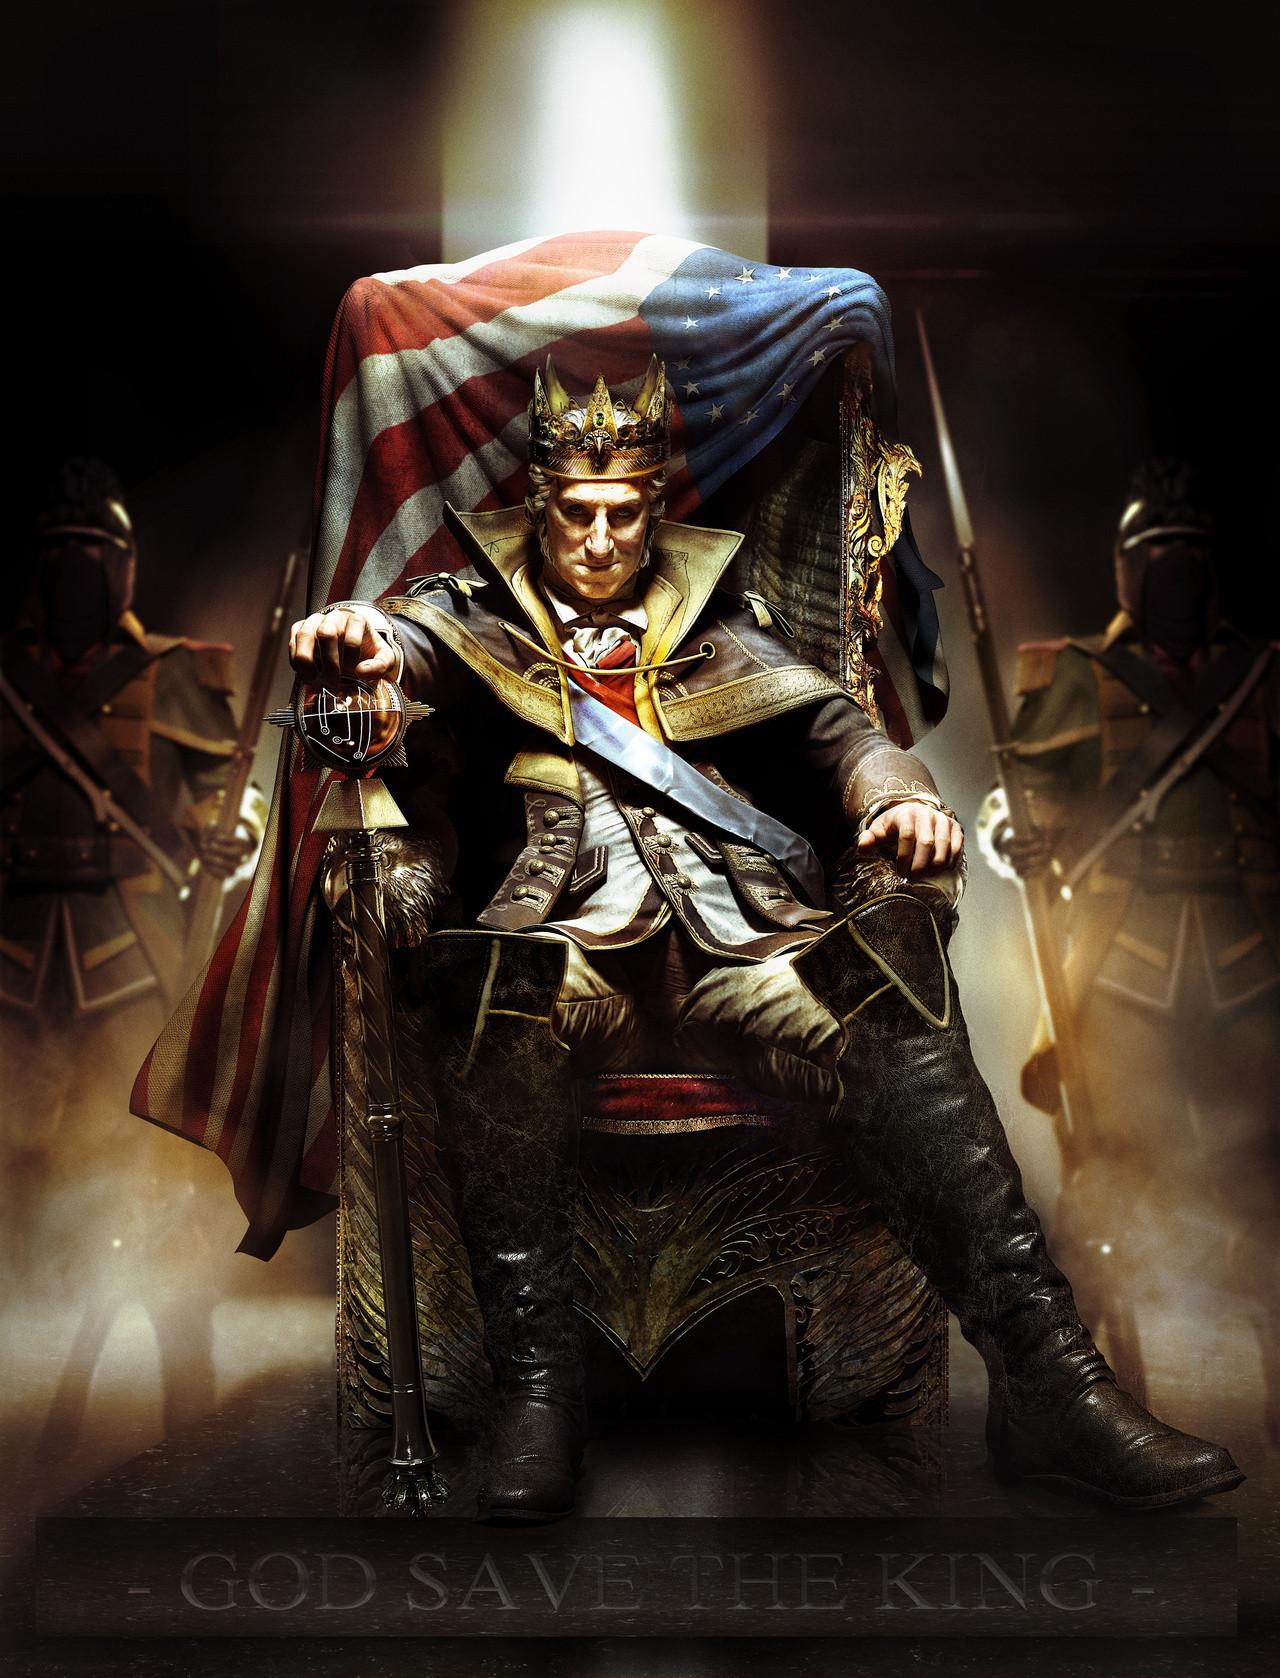 Assassin's Creed III - Page 2 Assassin-s-creed-iii-la-tyrannie-du-roi-washington-playstation-3-ps3-1349285253-001